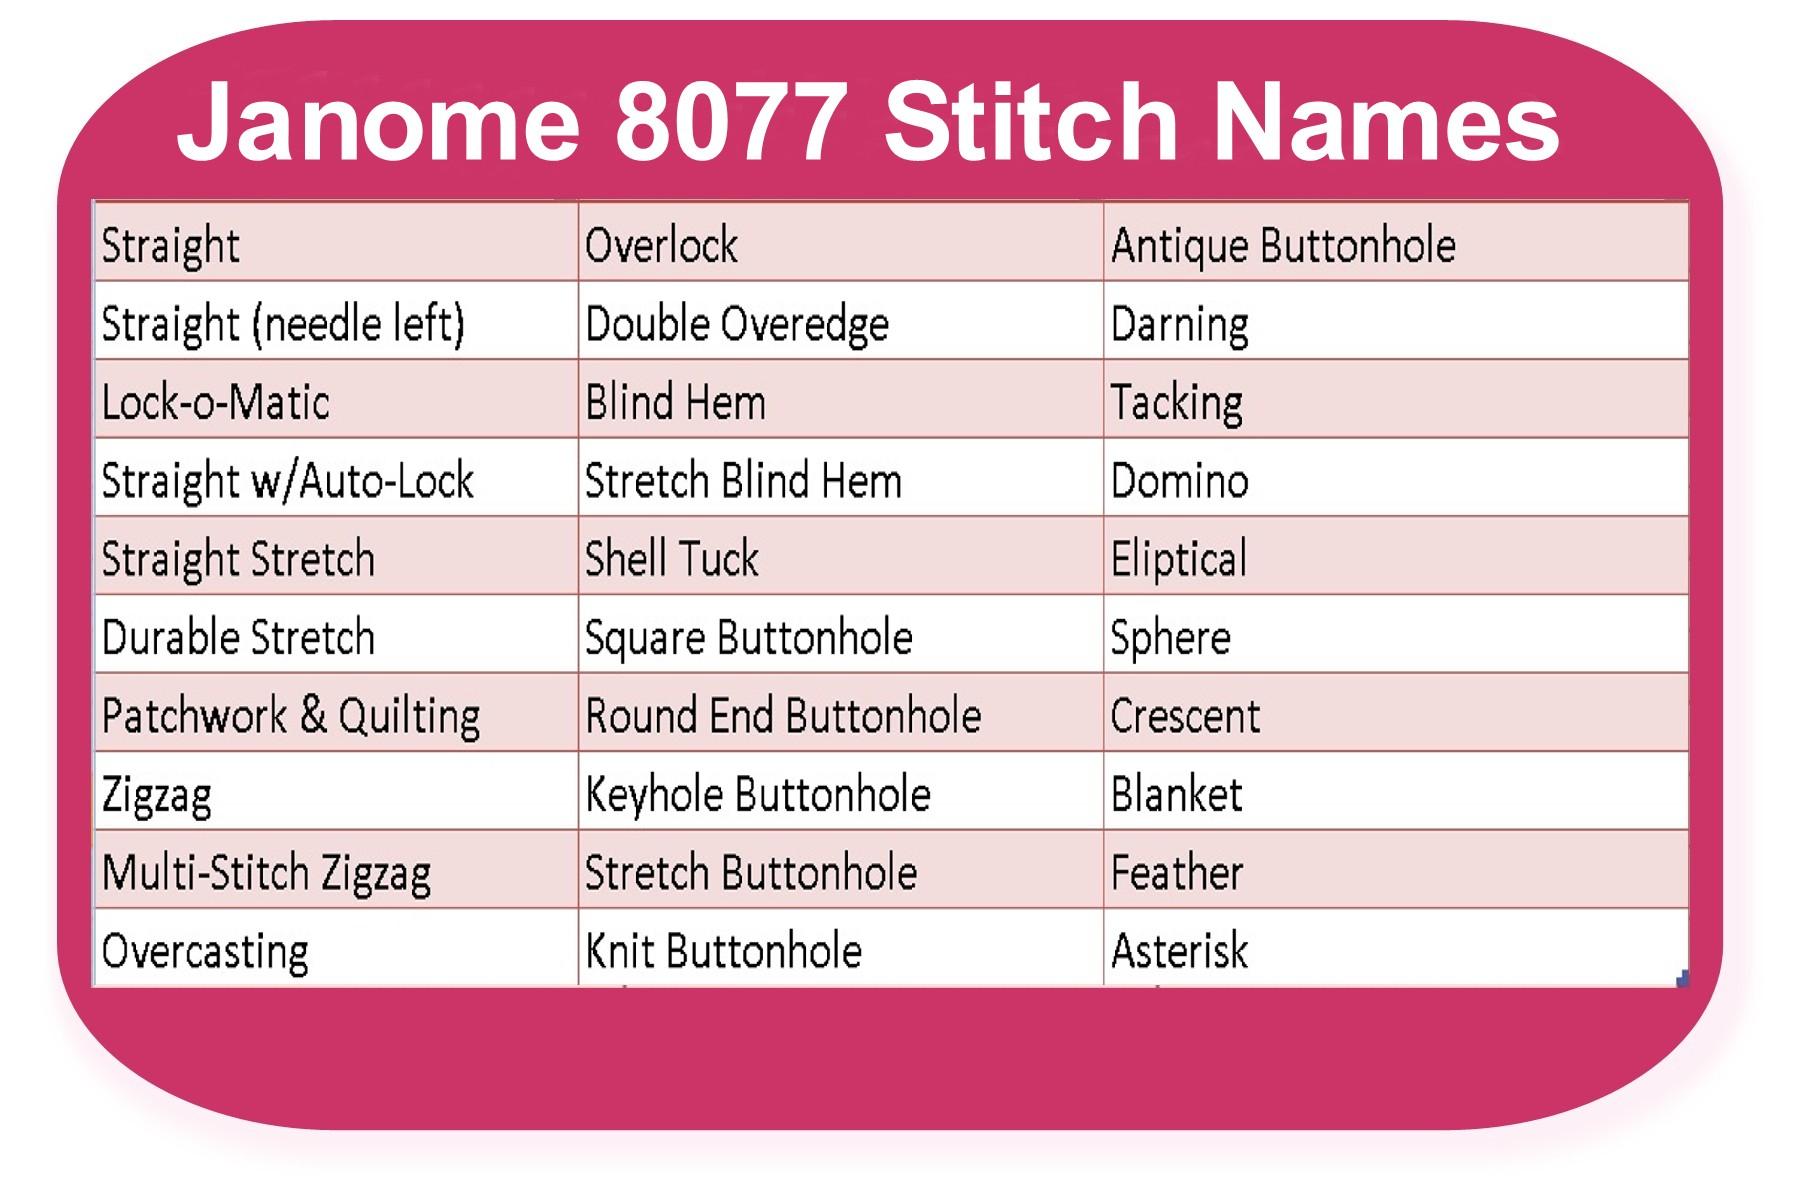 Janome 8077 Stitch Names